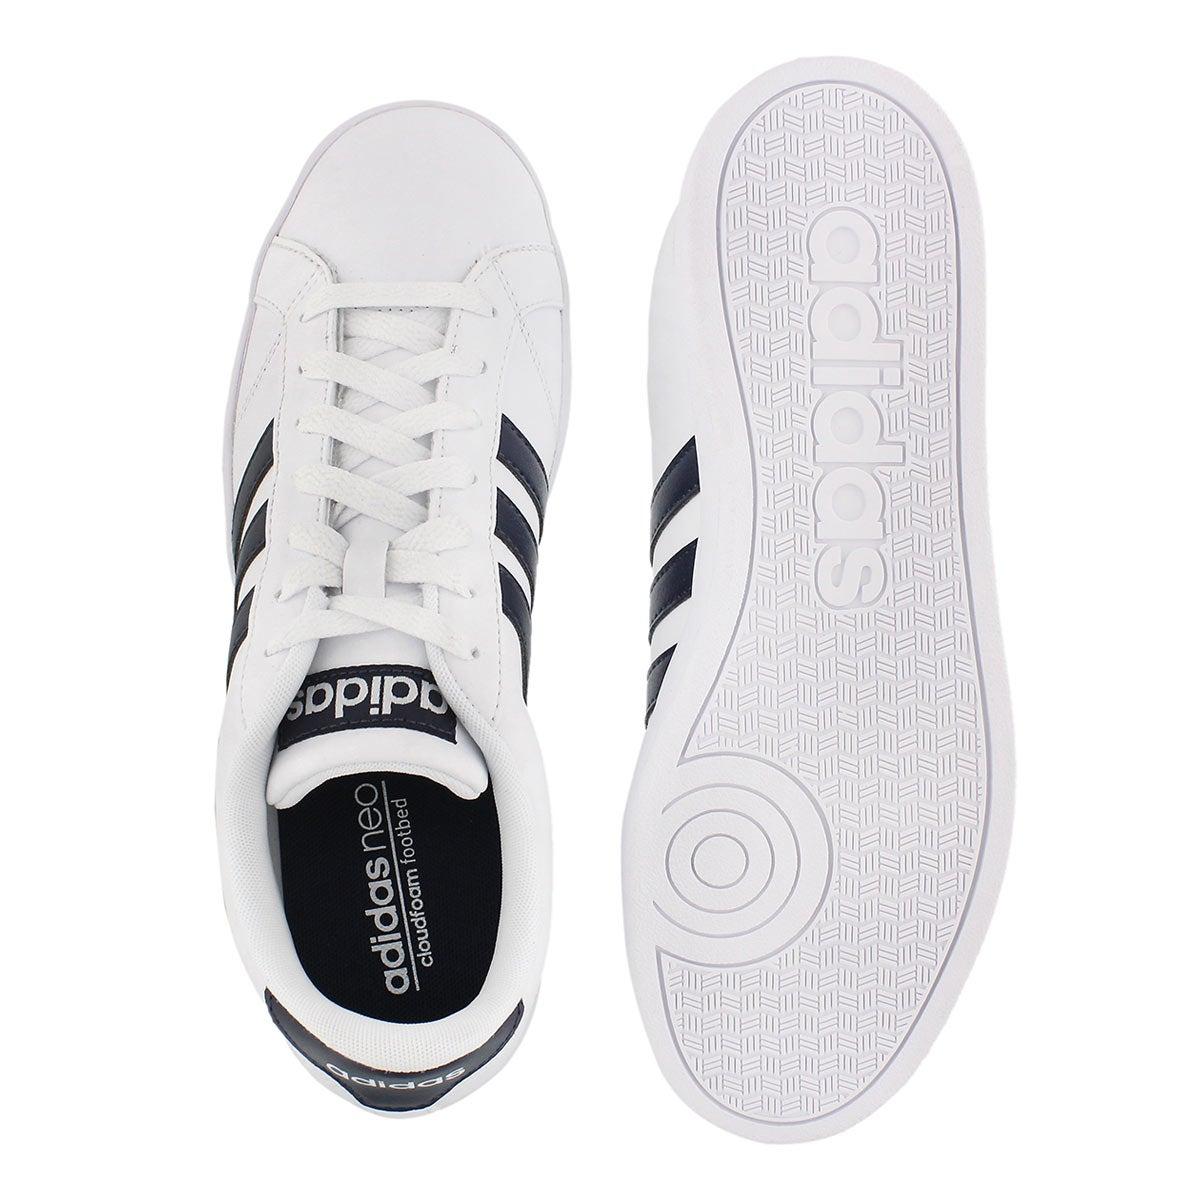 Mns Baseline wht/nvy stripe sneaker